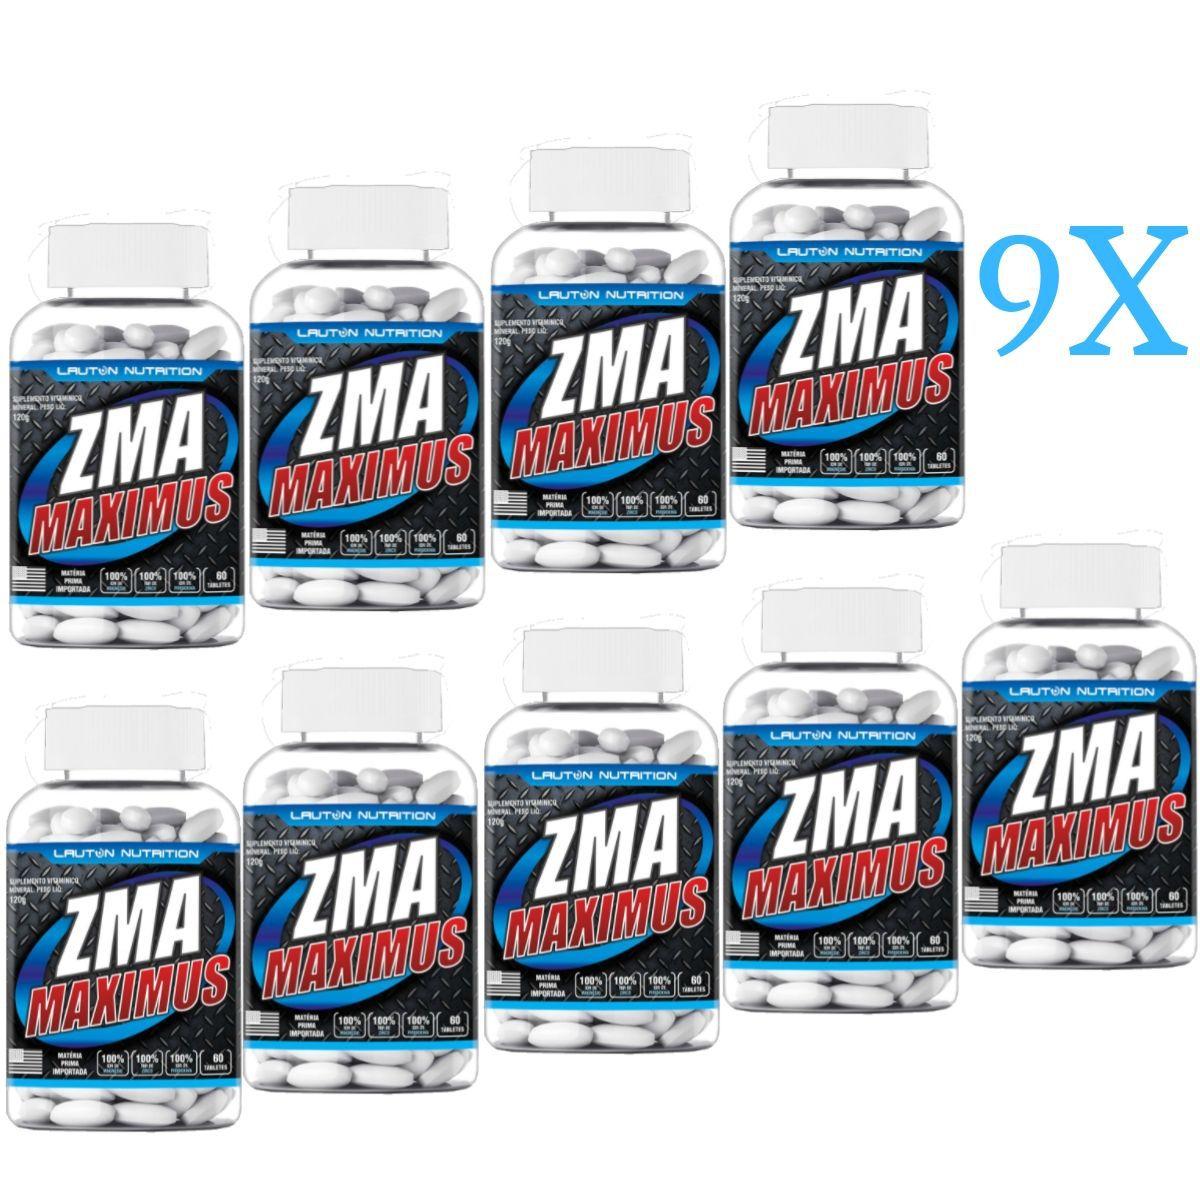 Kit 9 ZMA Maximus Lauton Nutrition - 60 Tablets 1G